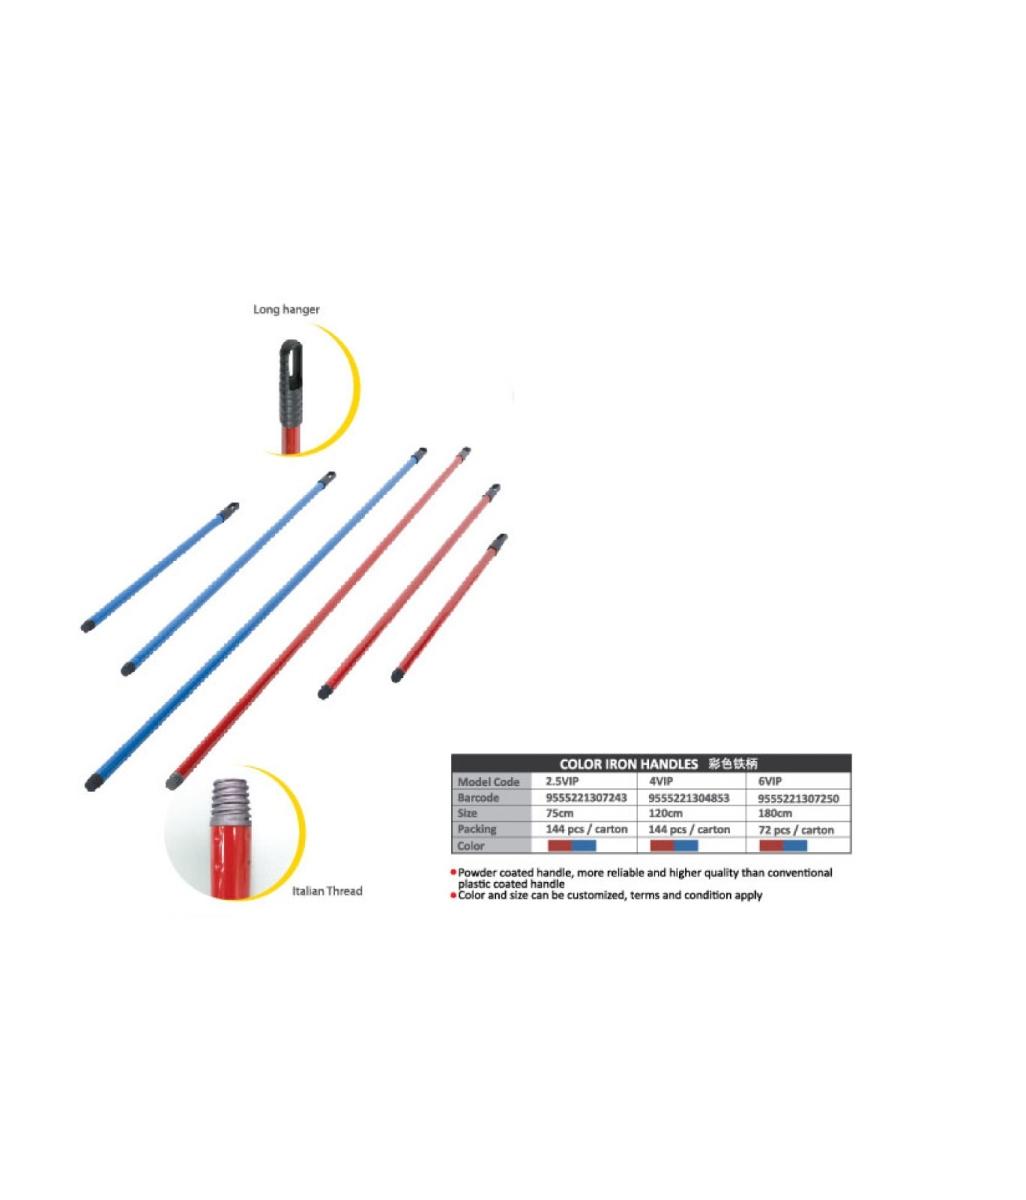 (2.5VIP) Color Iron Handles Handles Series Malaysia, Selangor, Johor Bahru (JB), Kuala Lumpur (KL), Rawang, Kempas Manufacturer, Supplier, Supply, Supplies | Perusahaan Cemerlang Raya Sdn Bhd